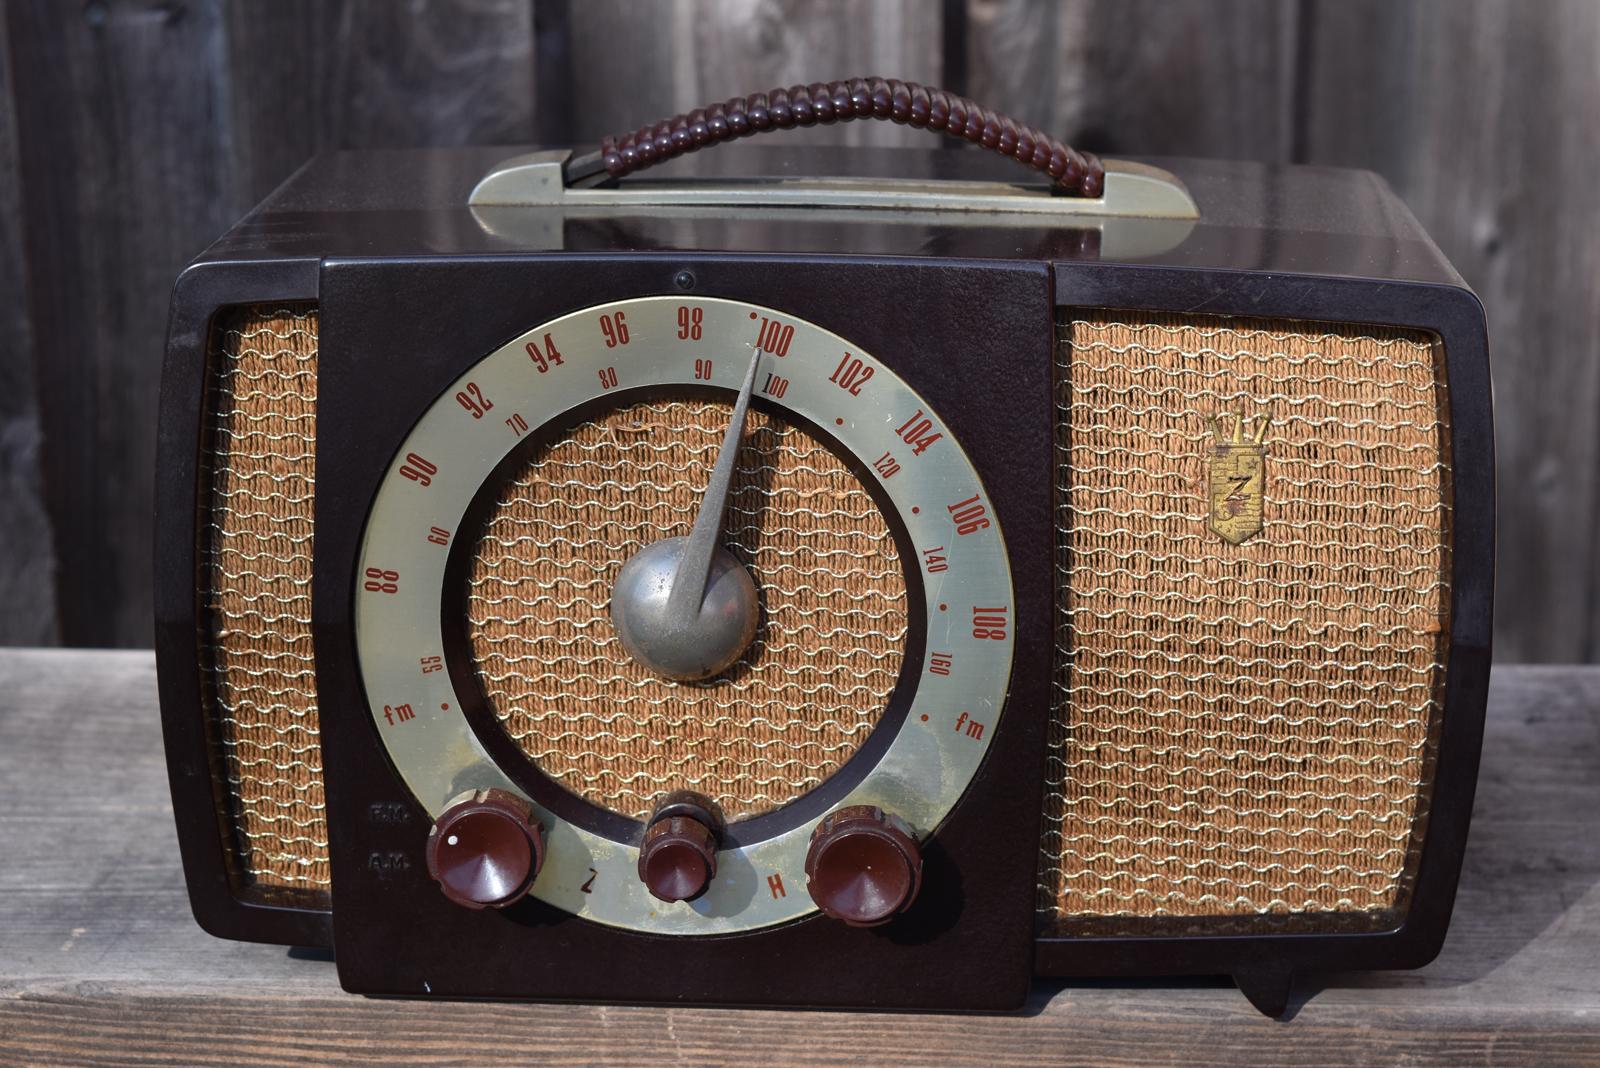 Radio by zenith year models Radio Attic's